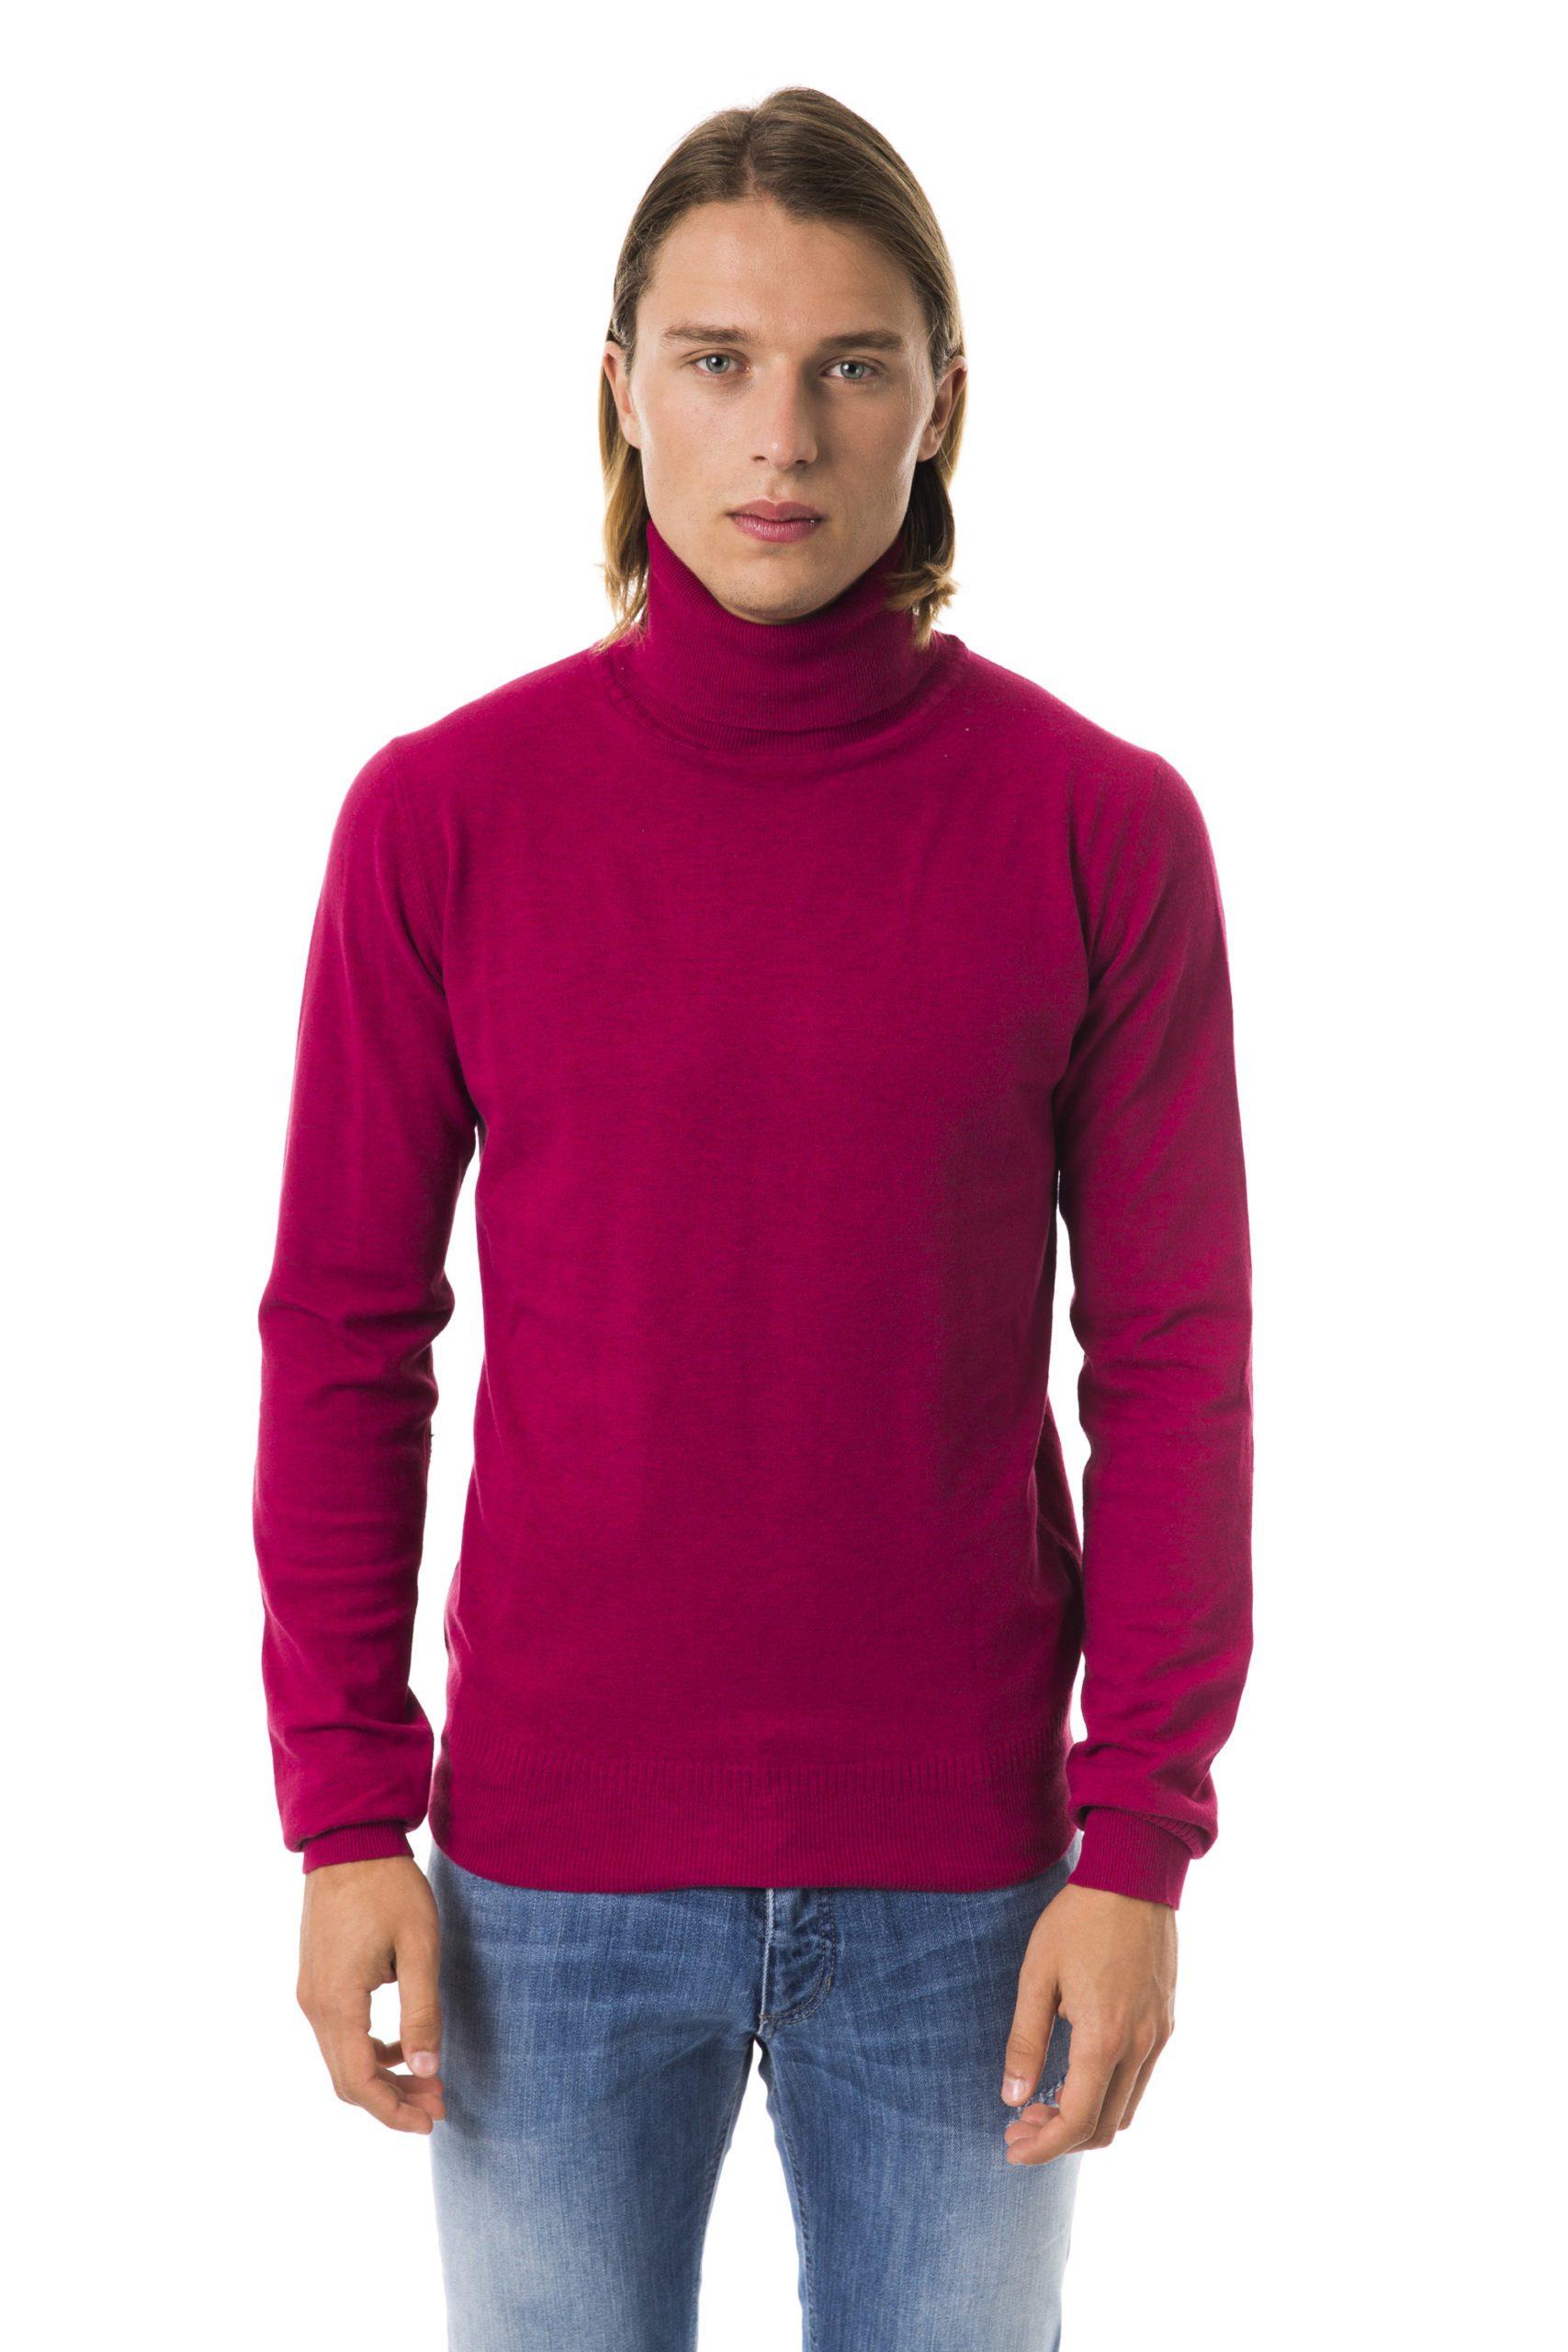 BYBLOS Men's Violaantico Sweater Fuchsia BY815835 - XL